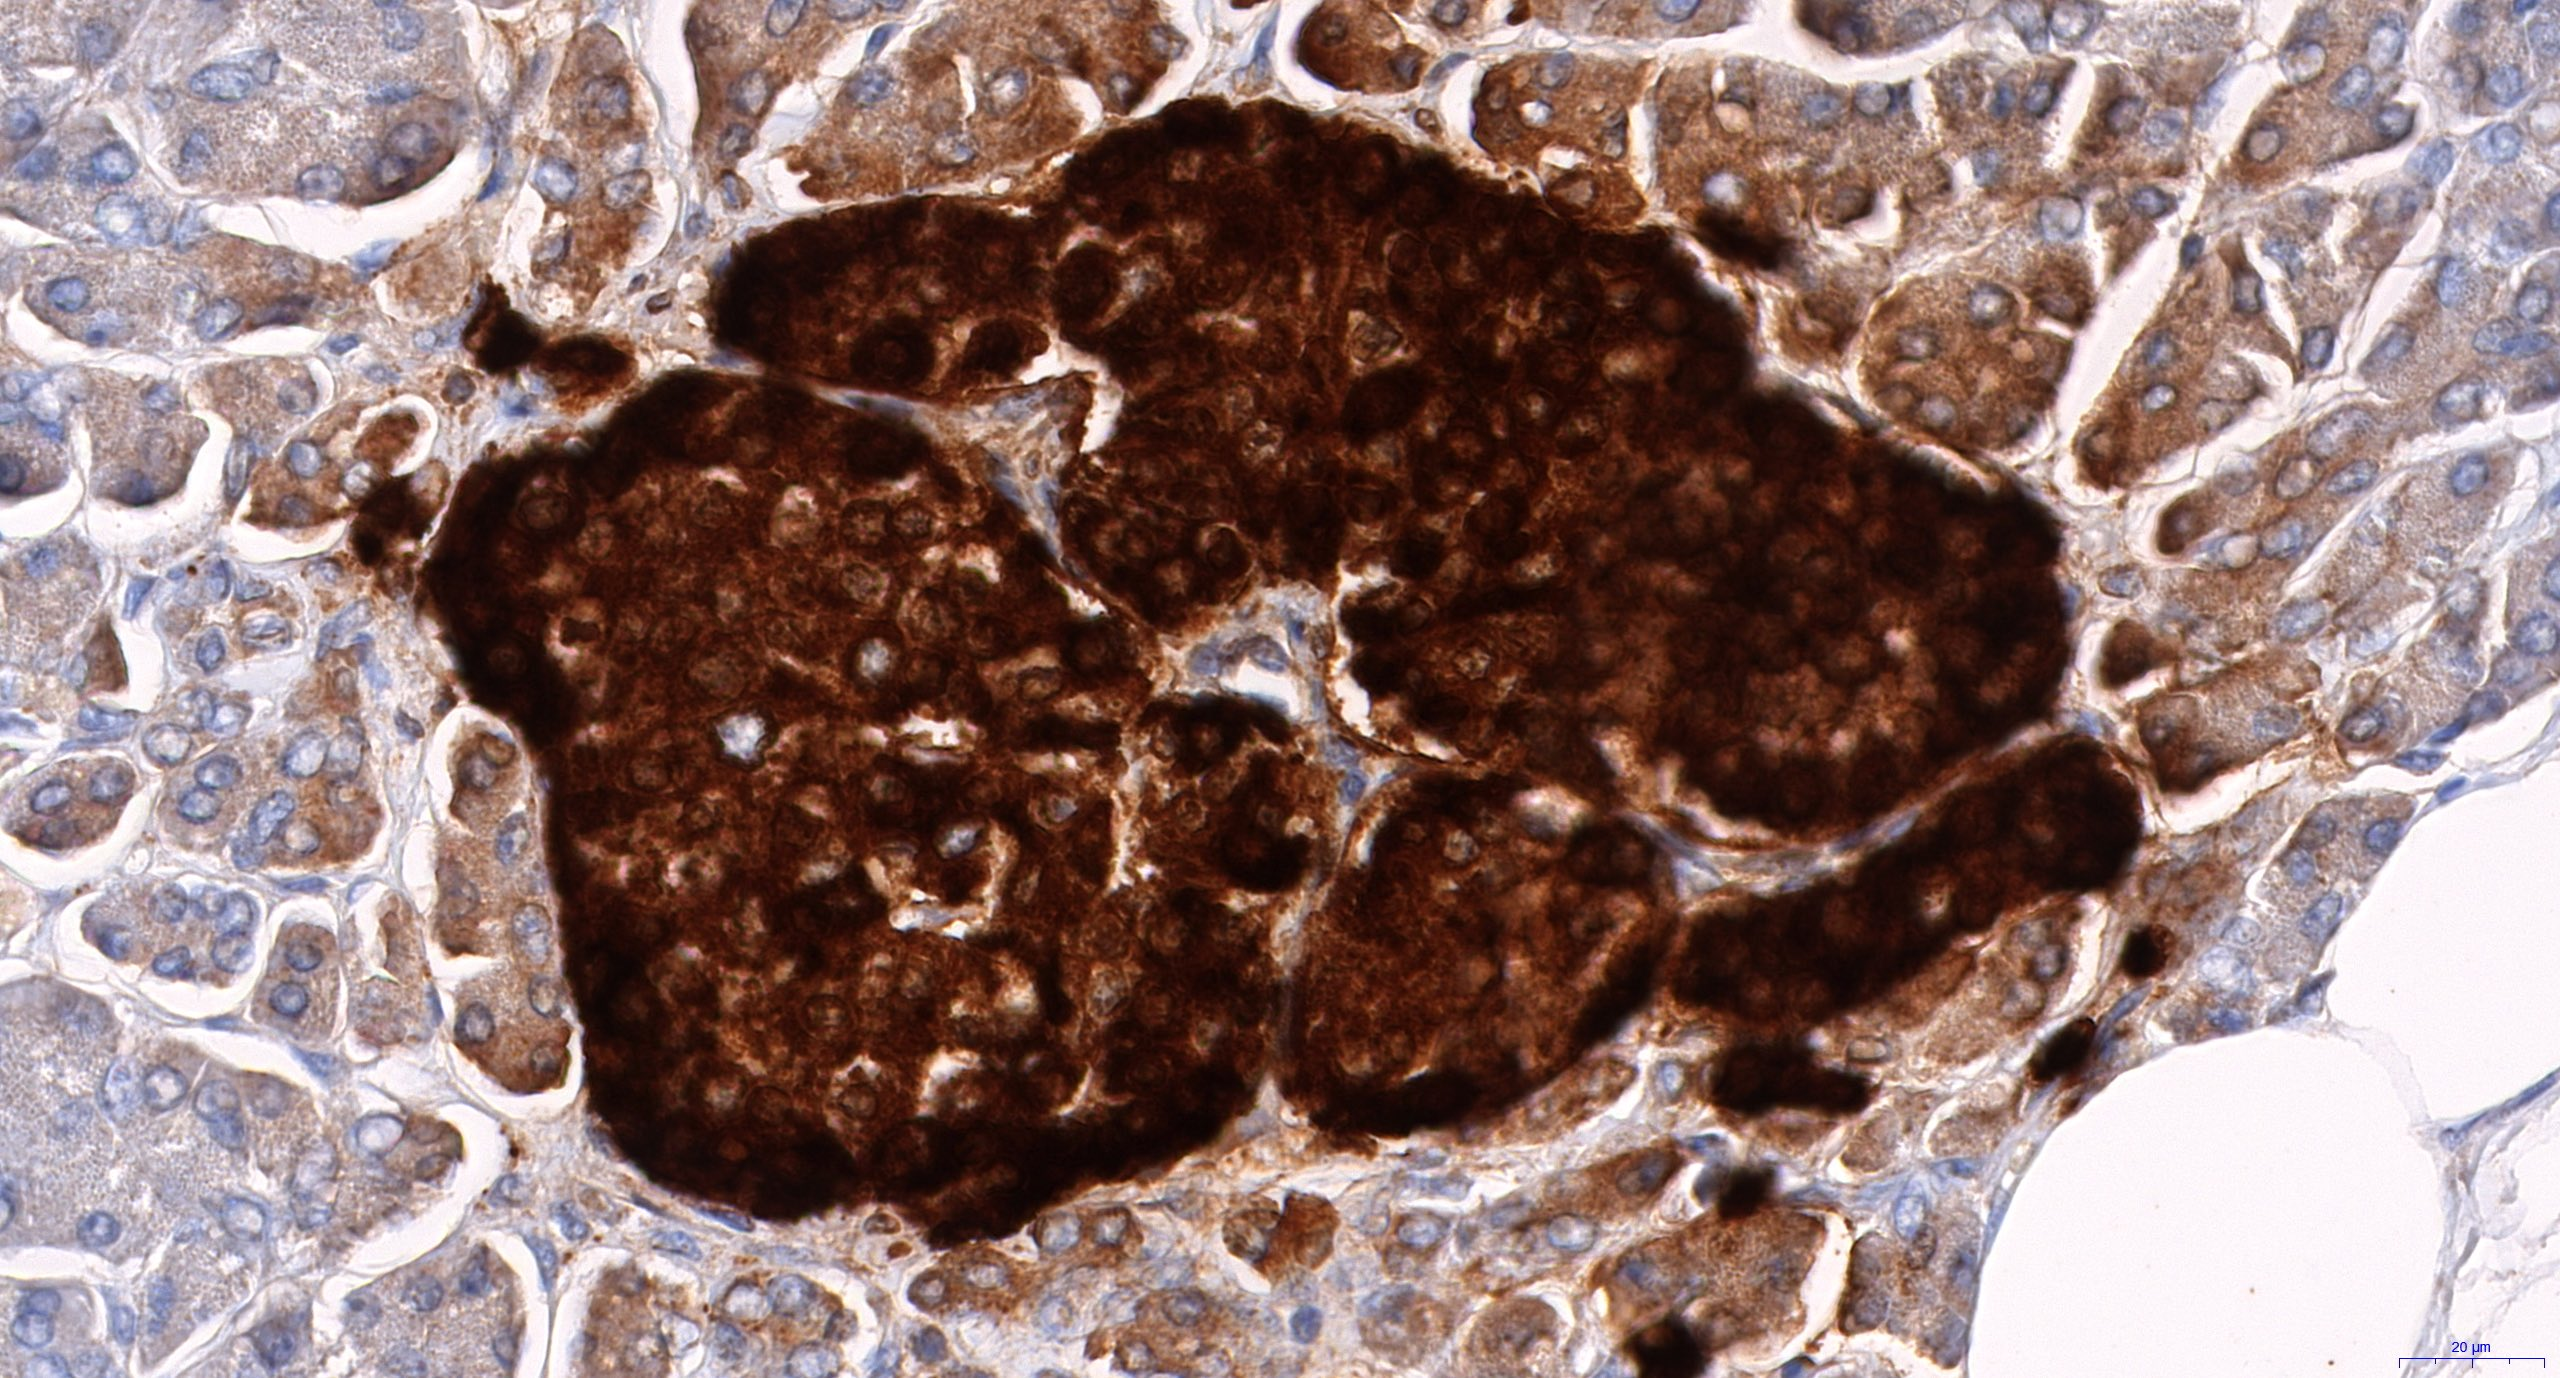 Chromogranin A IHC detail